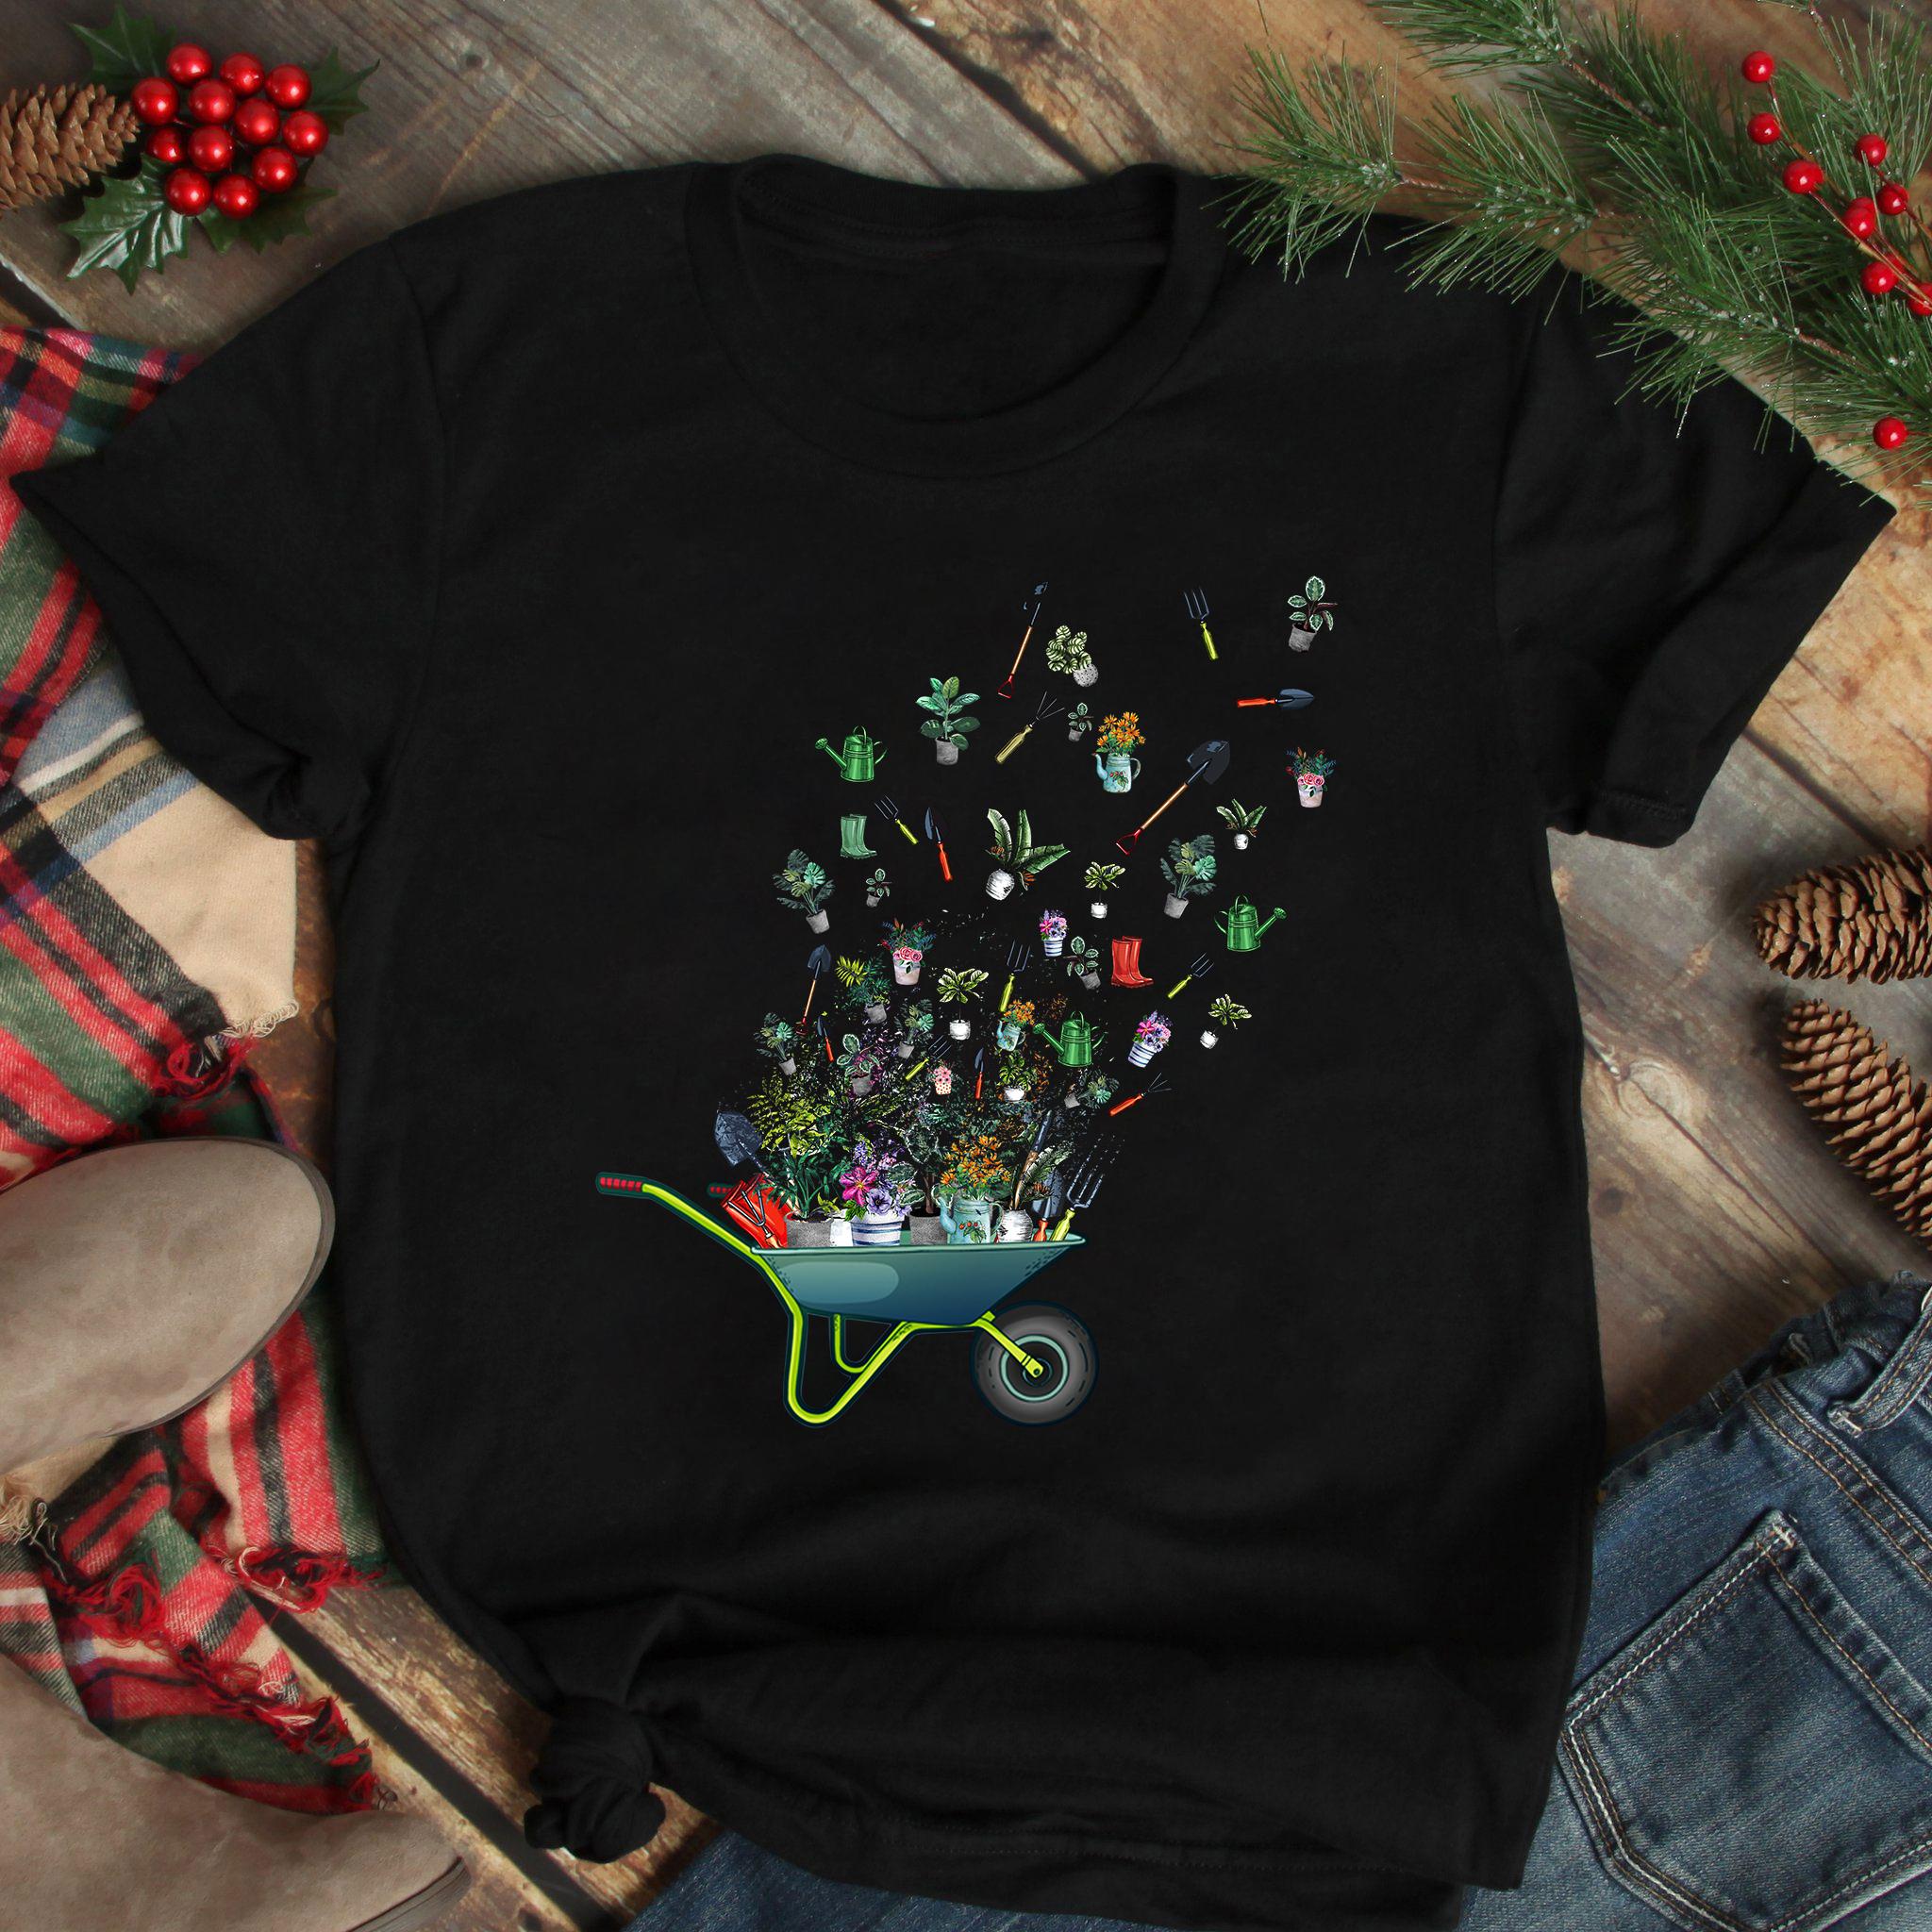 Garden Shirt Wheelbarrow Gardening Tools Flying